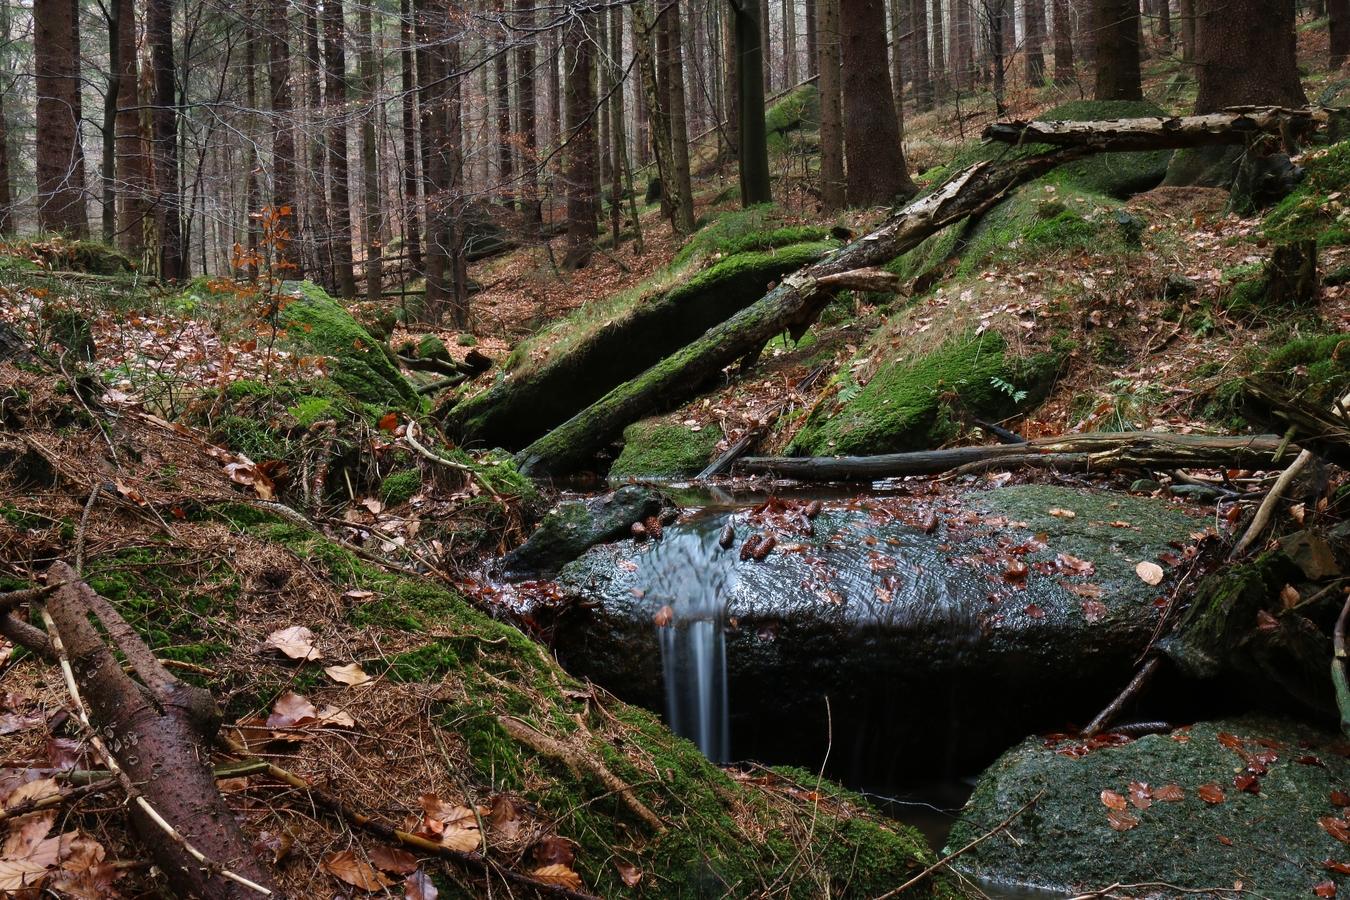 Les plný potůčků s mini vodopády ll.